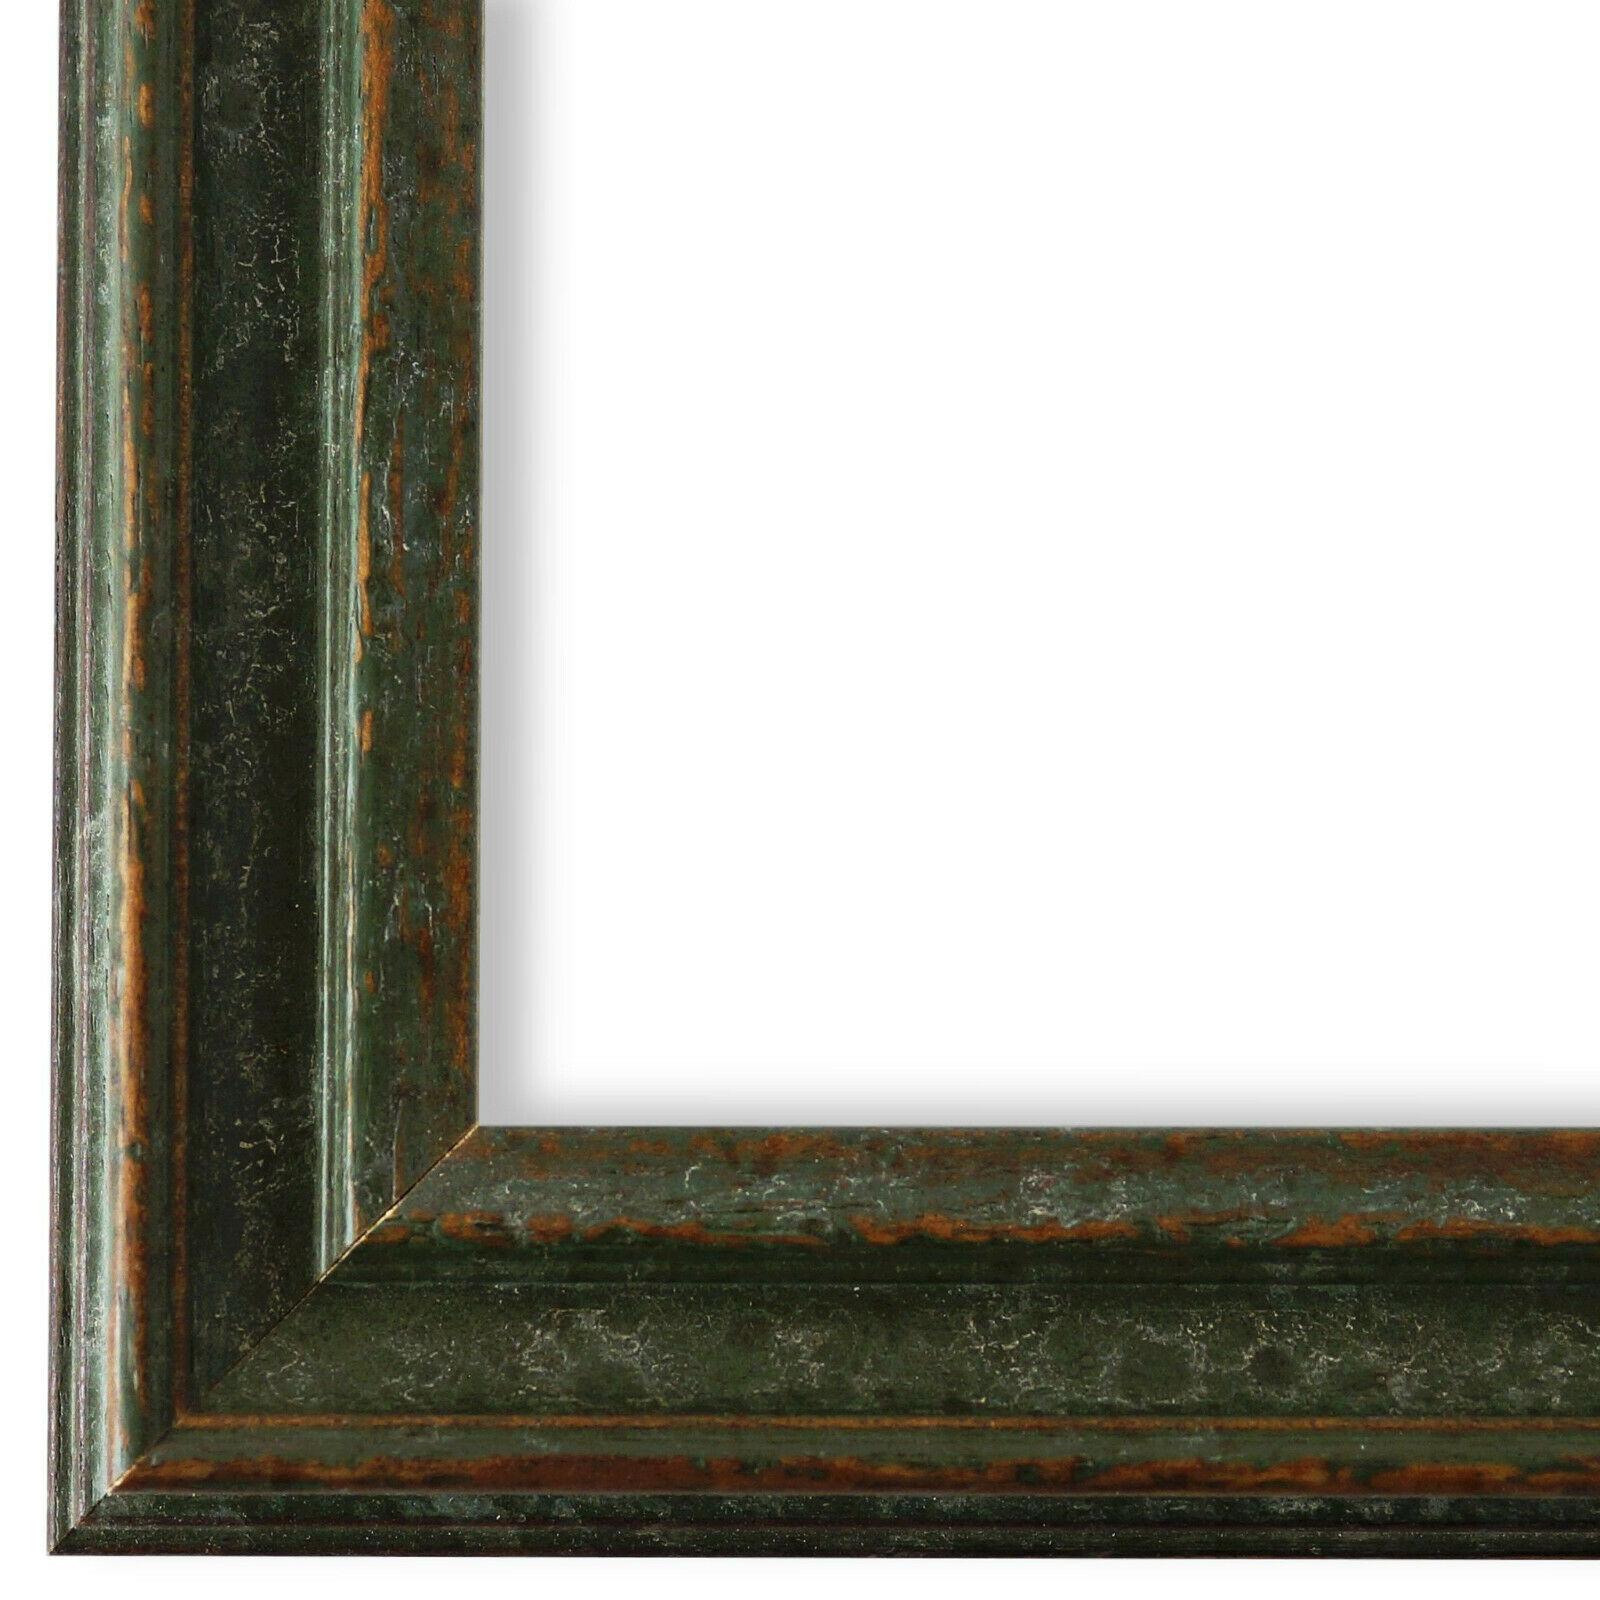 NEU alle Größen Bilderrahmen Rahmen Grün Gold Vintage Retro Holz Forli 3,7